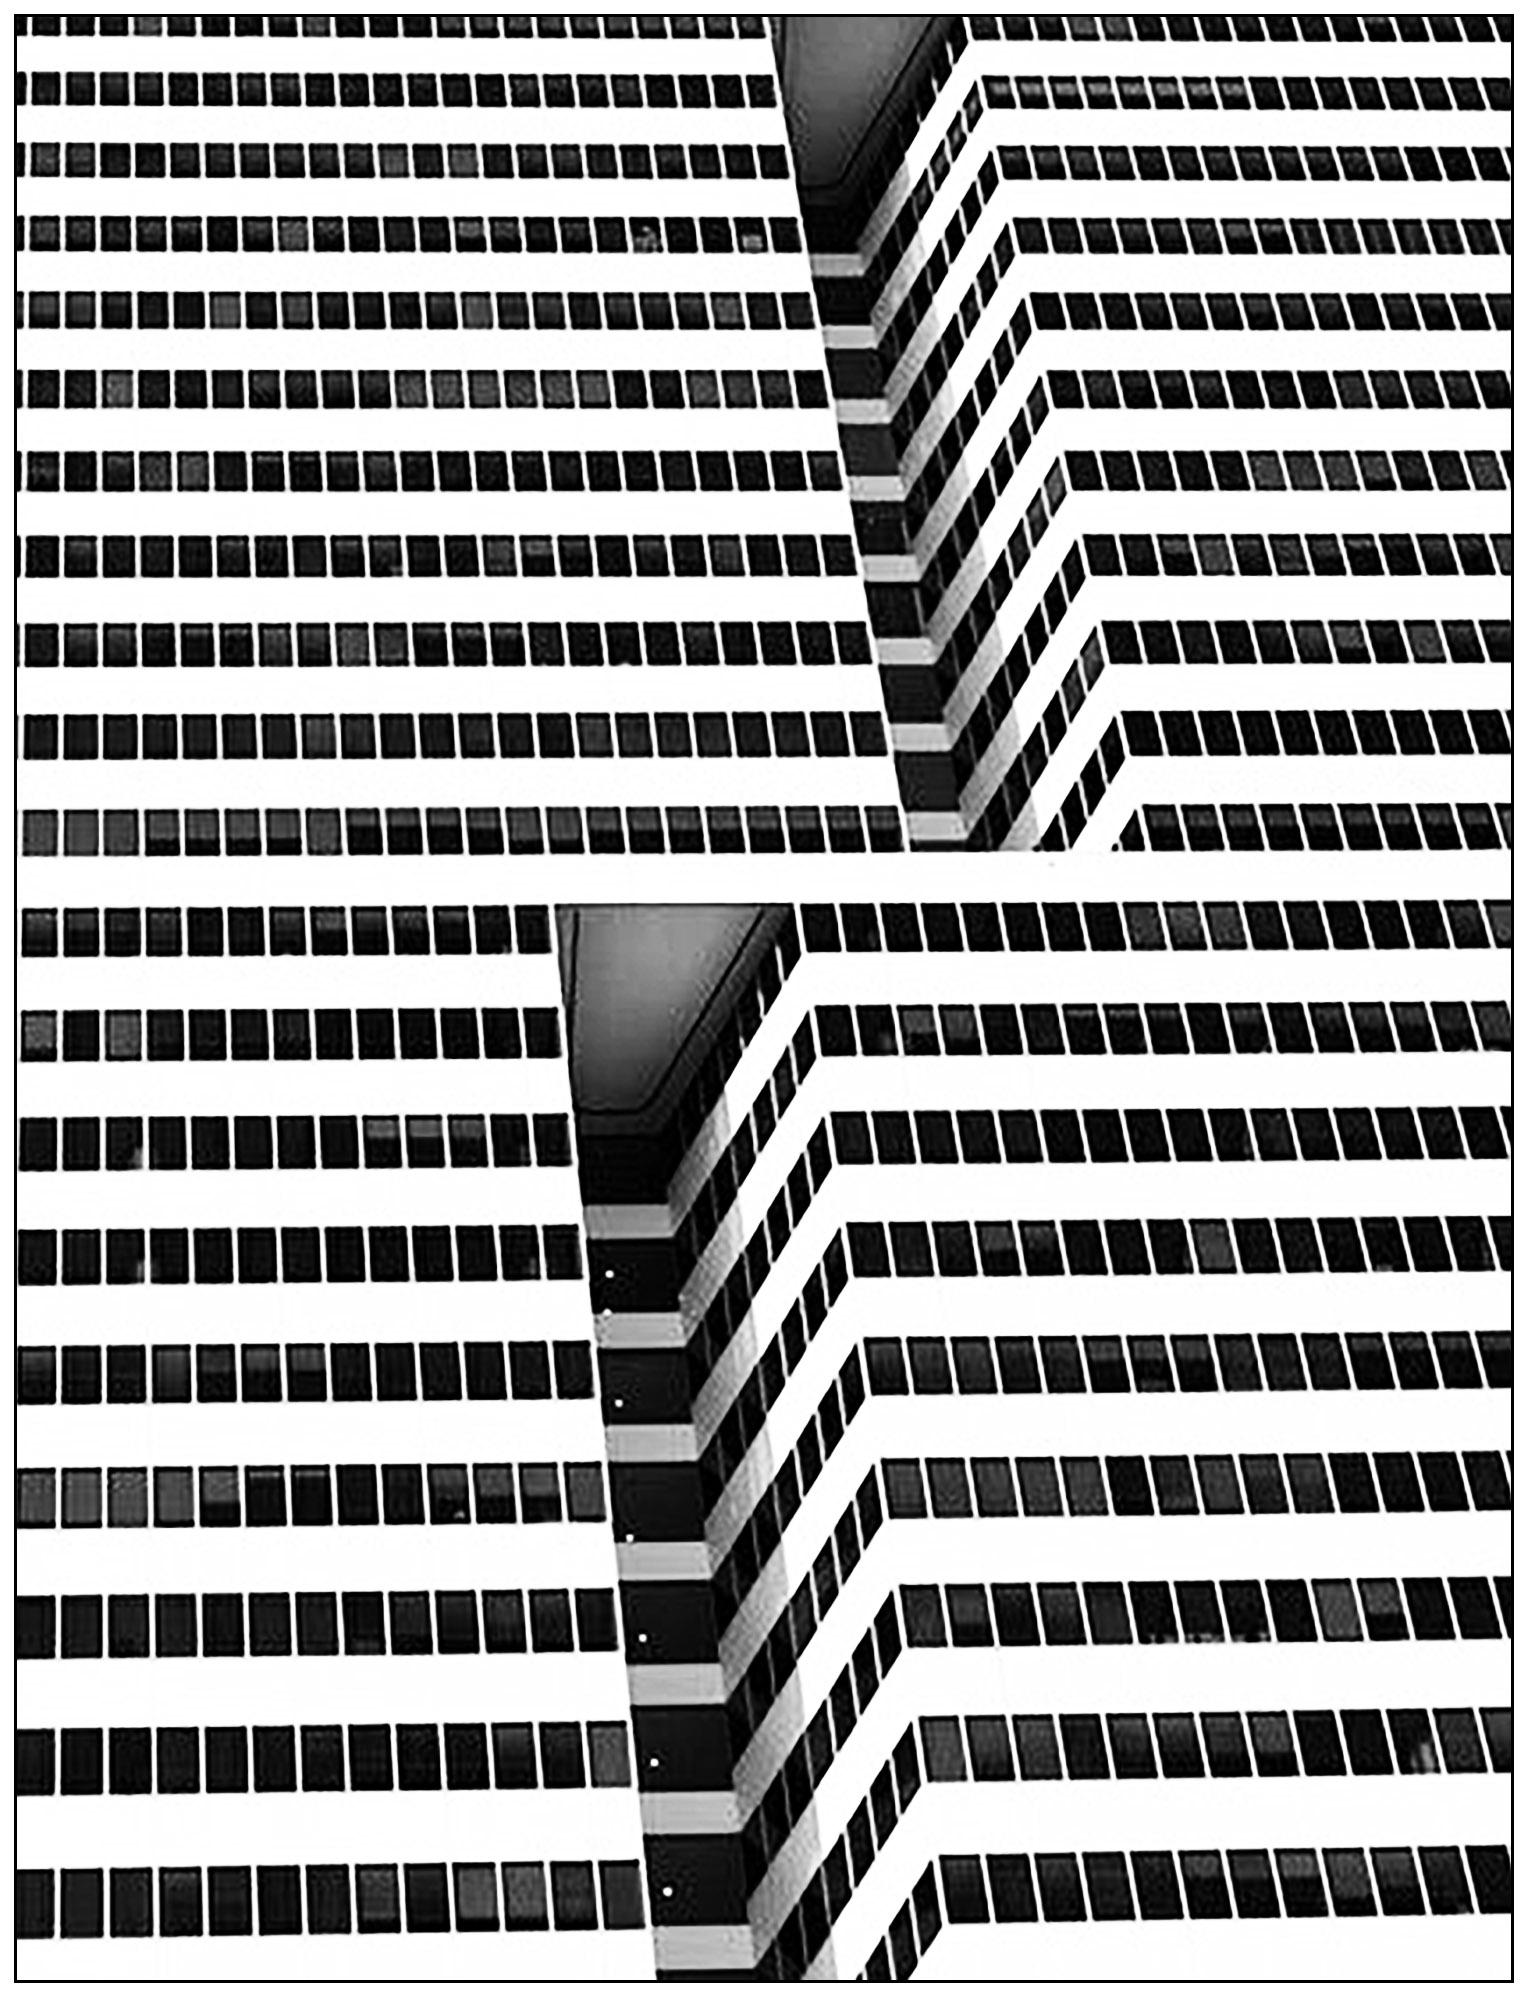 Etrange architecture